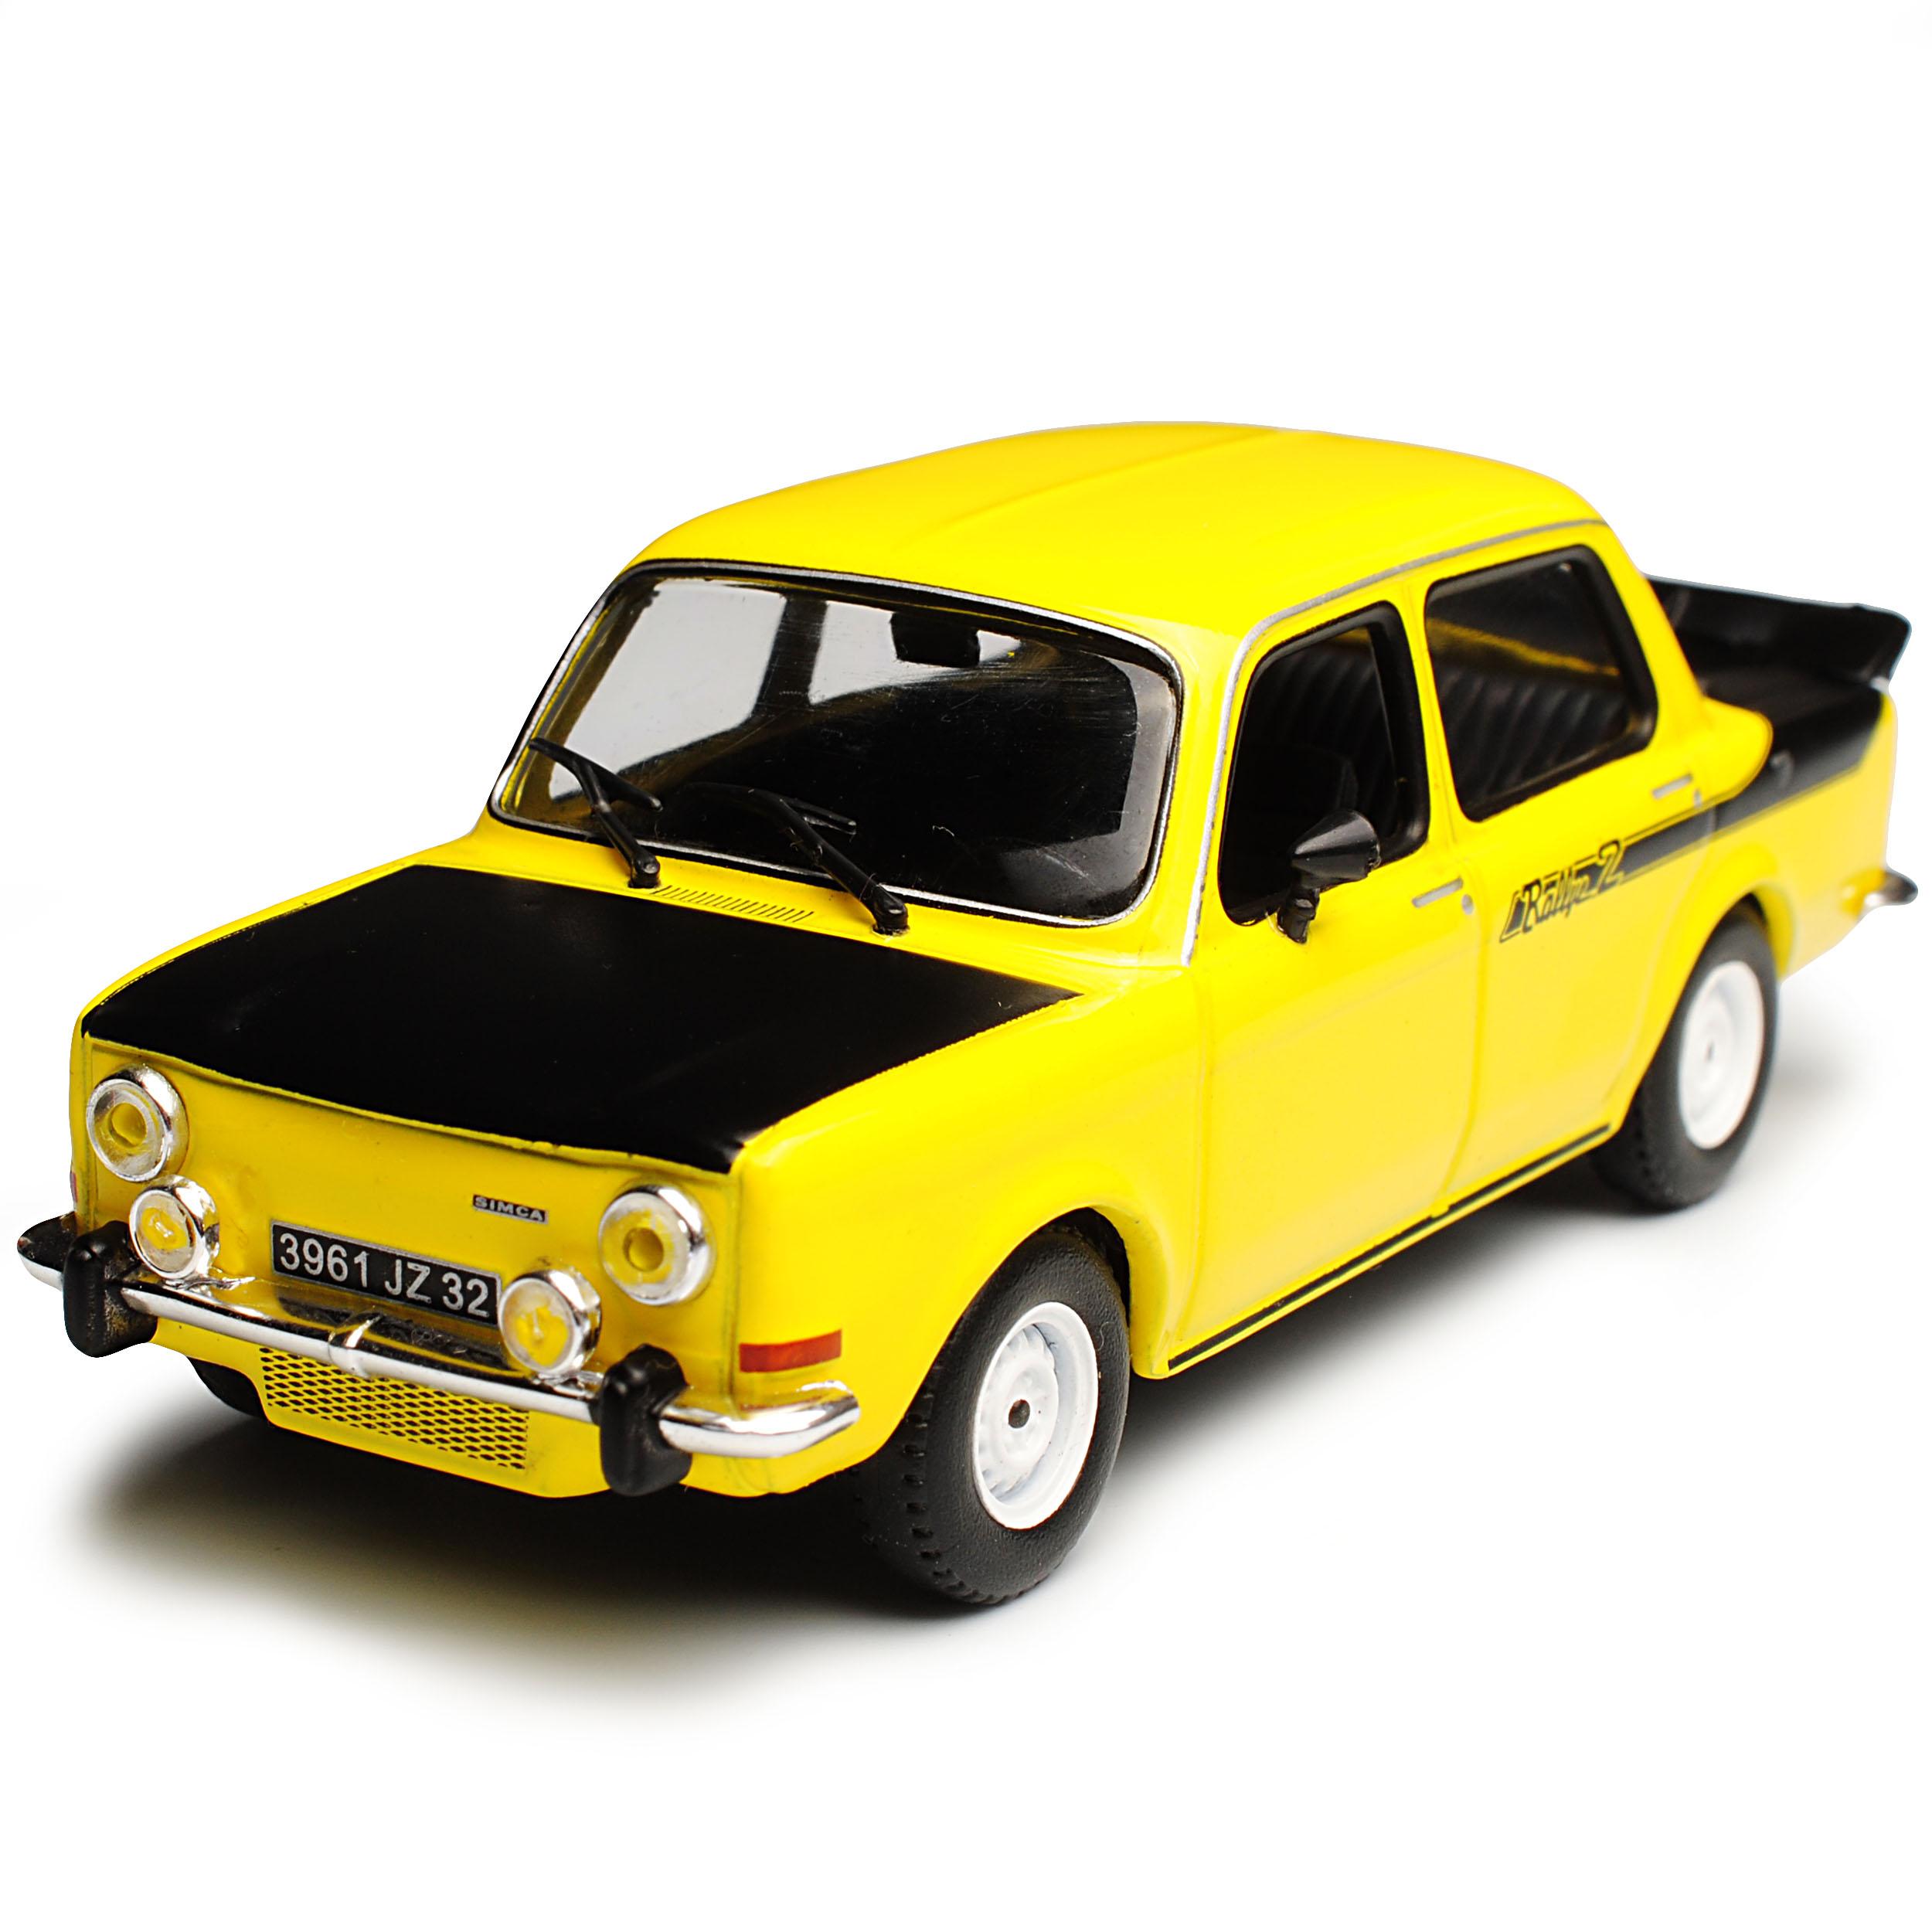 Simca 1000 rallye 2 limousine gelb 1974 1     43 solido modell - mit oder ohne. 646120